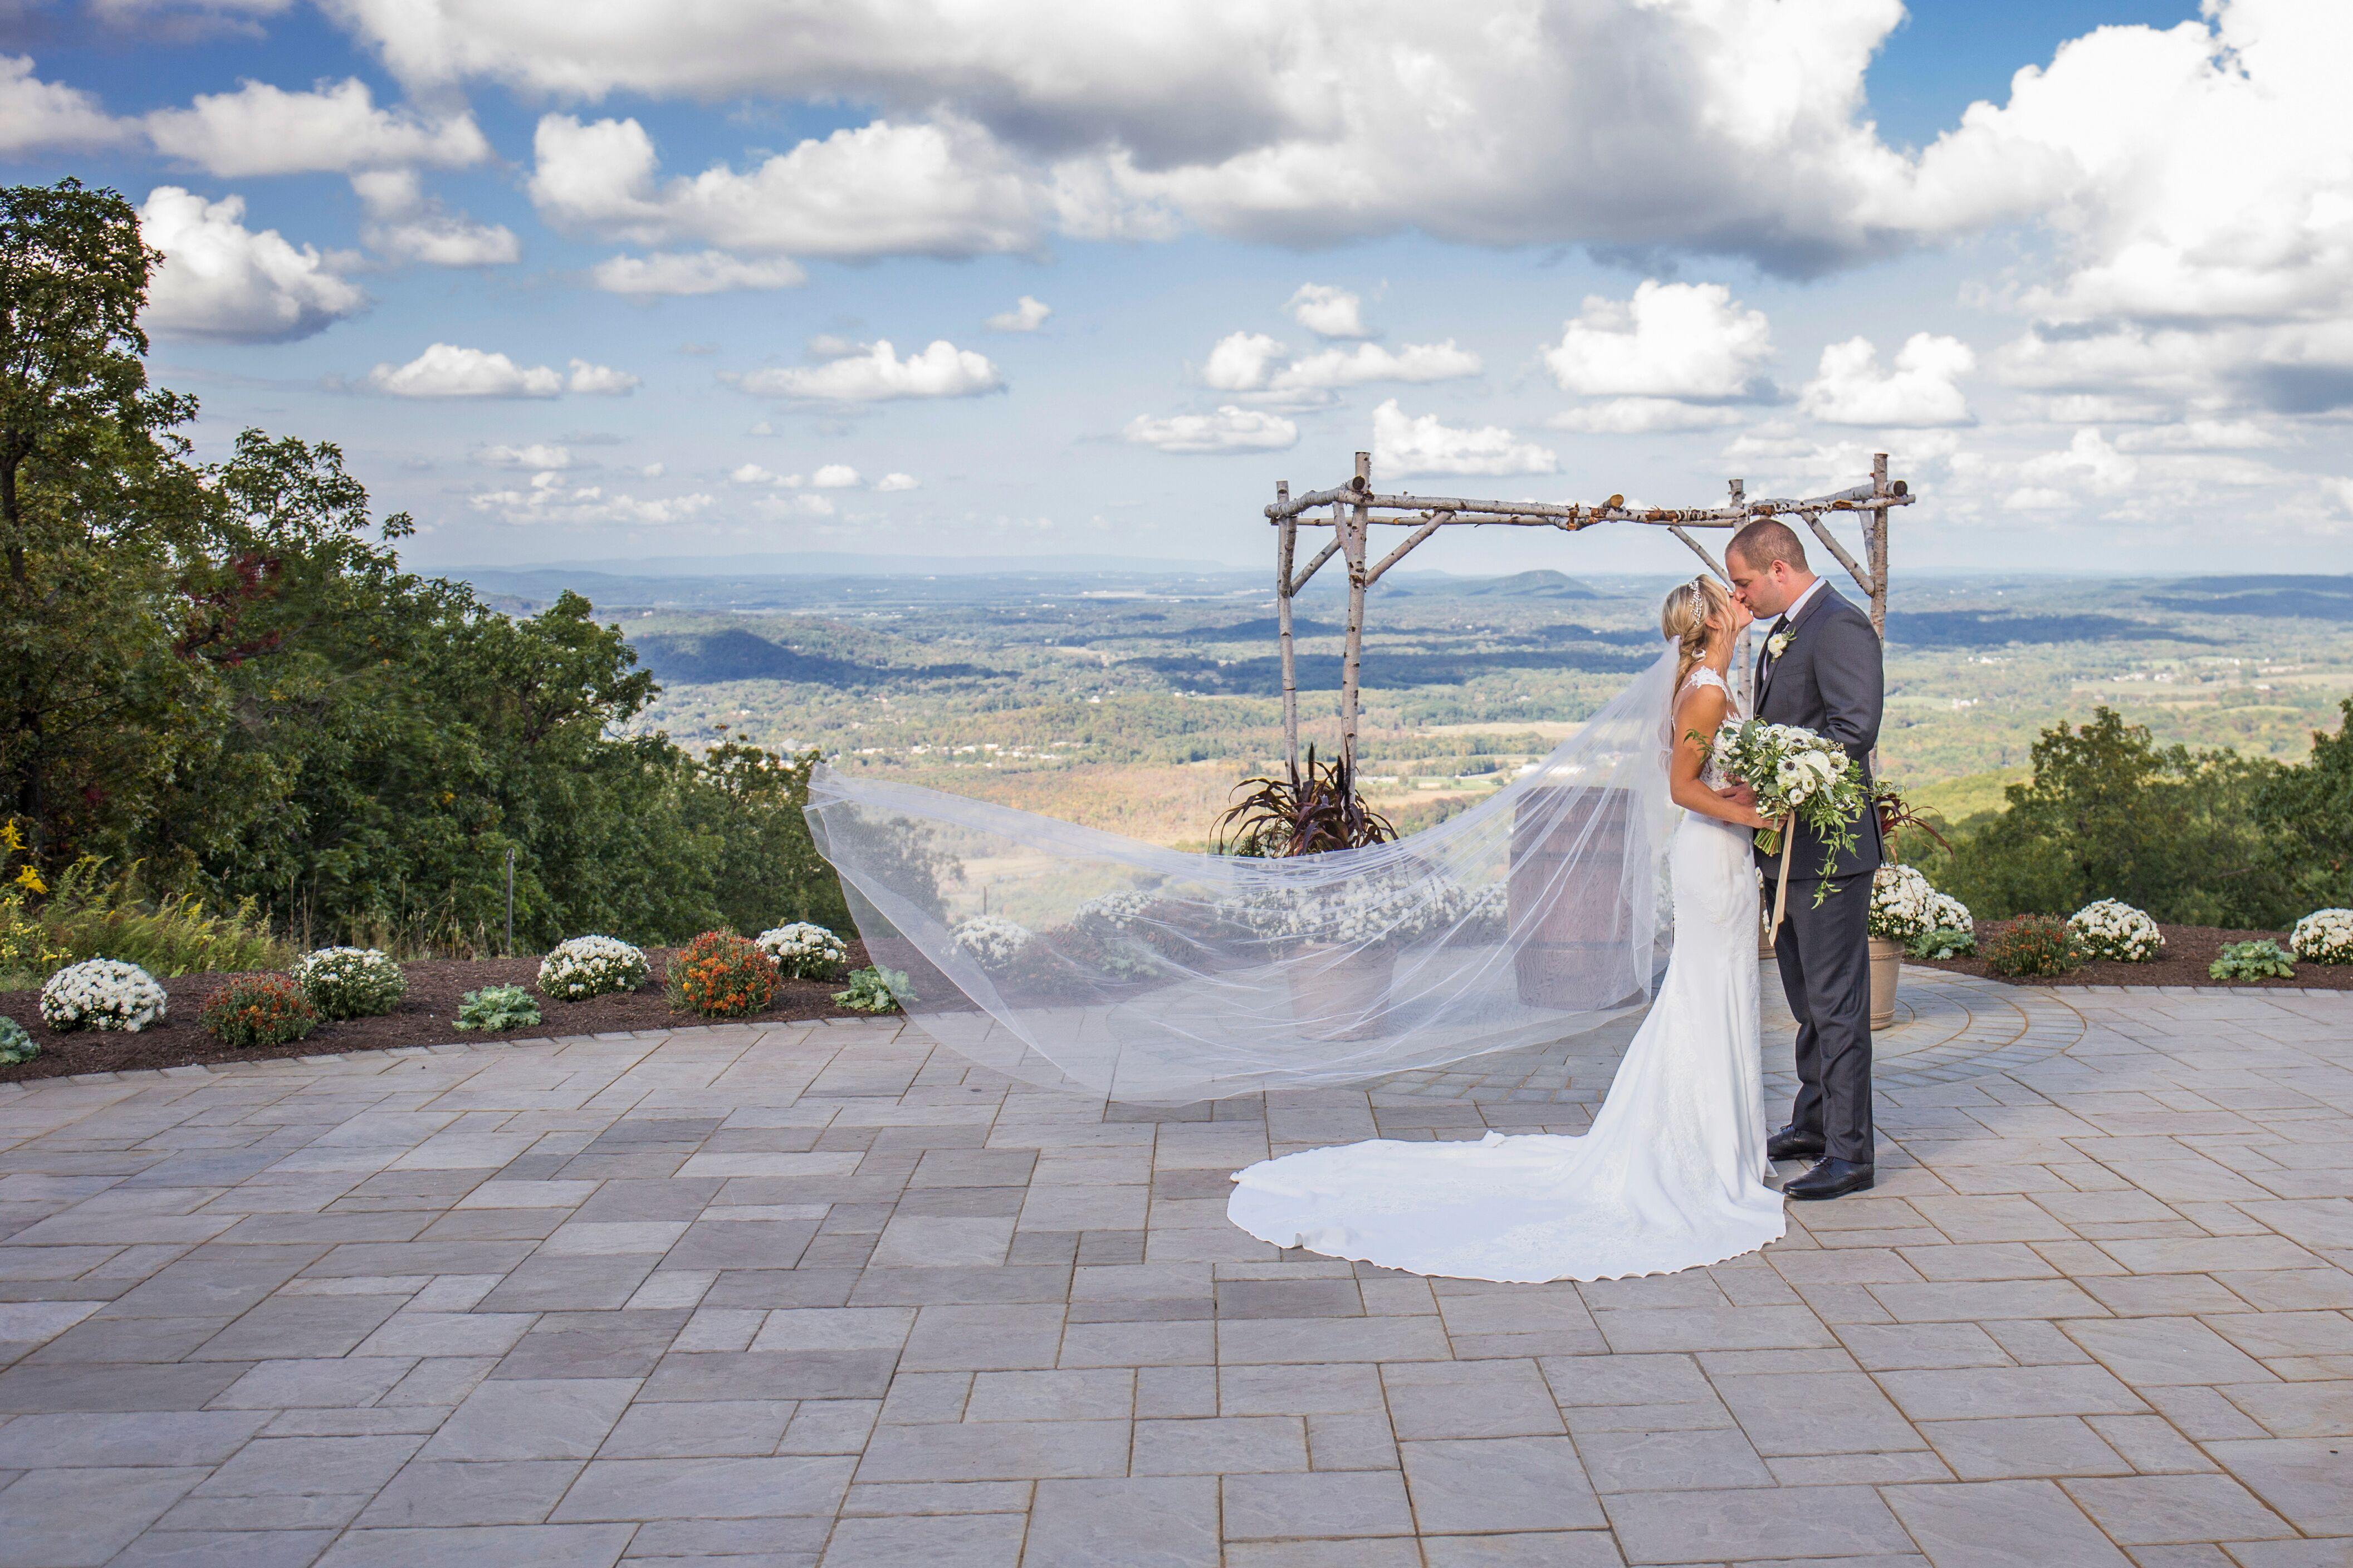 mountain creek resort | reception venues - vernon, nj